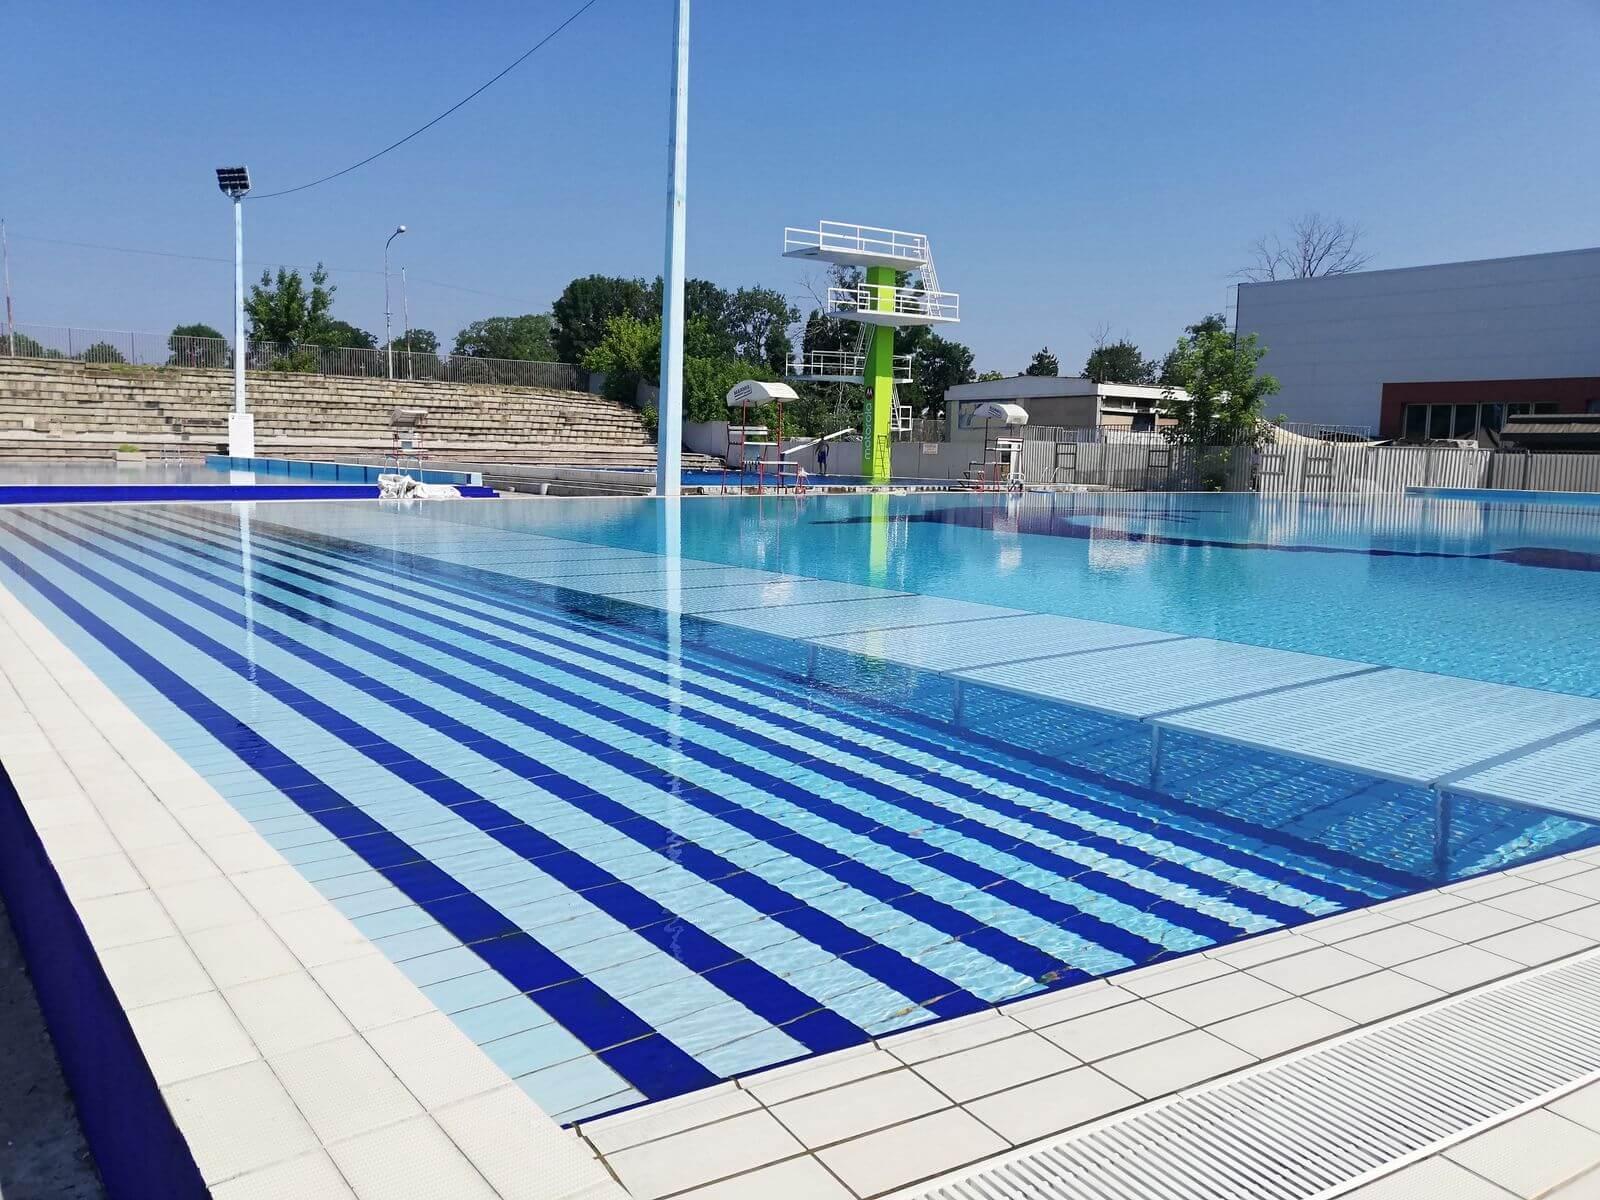 You are currently viewing Početak nove kupališne sezone na gradskim bazenima